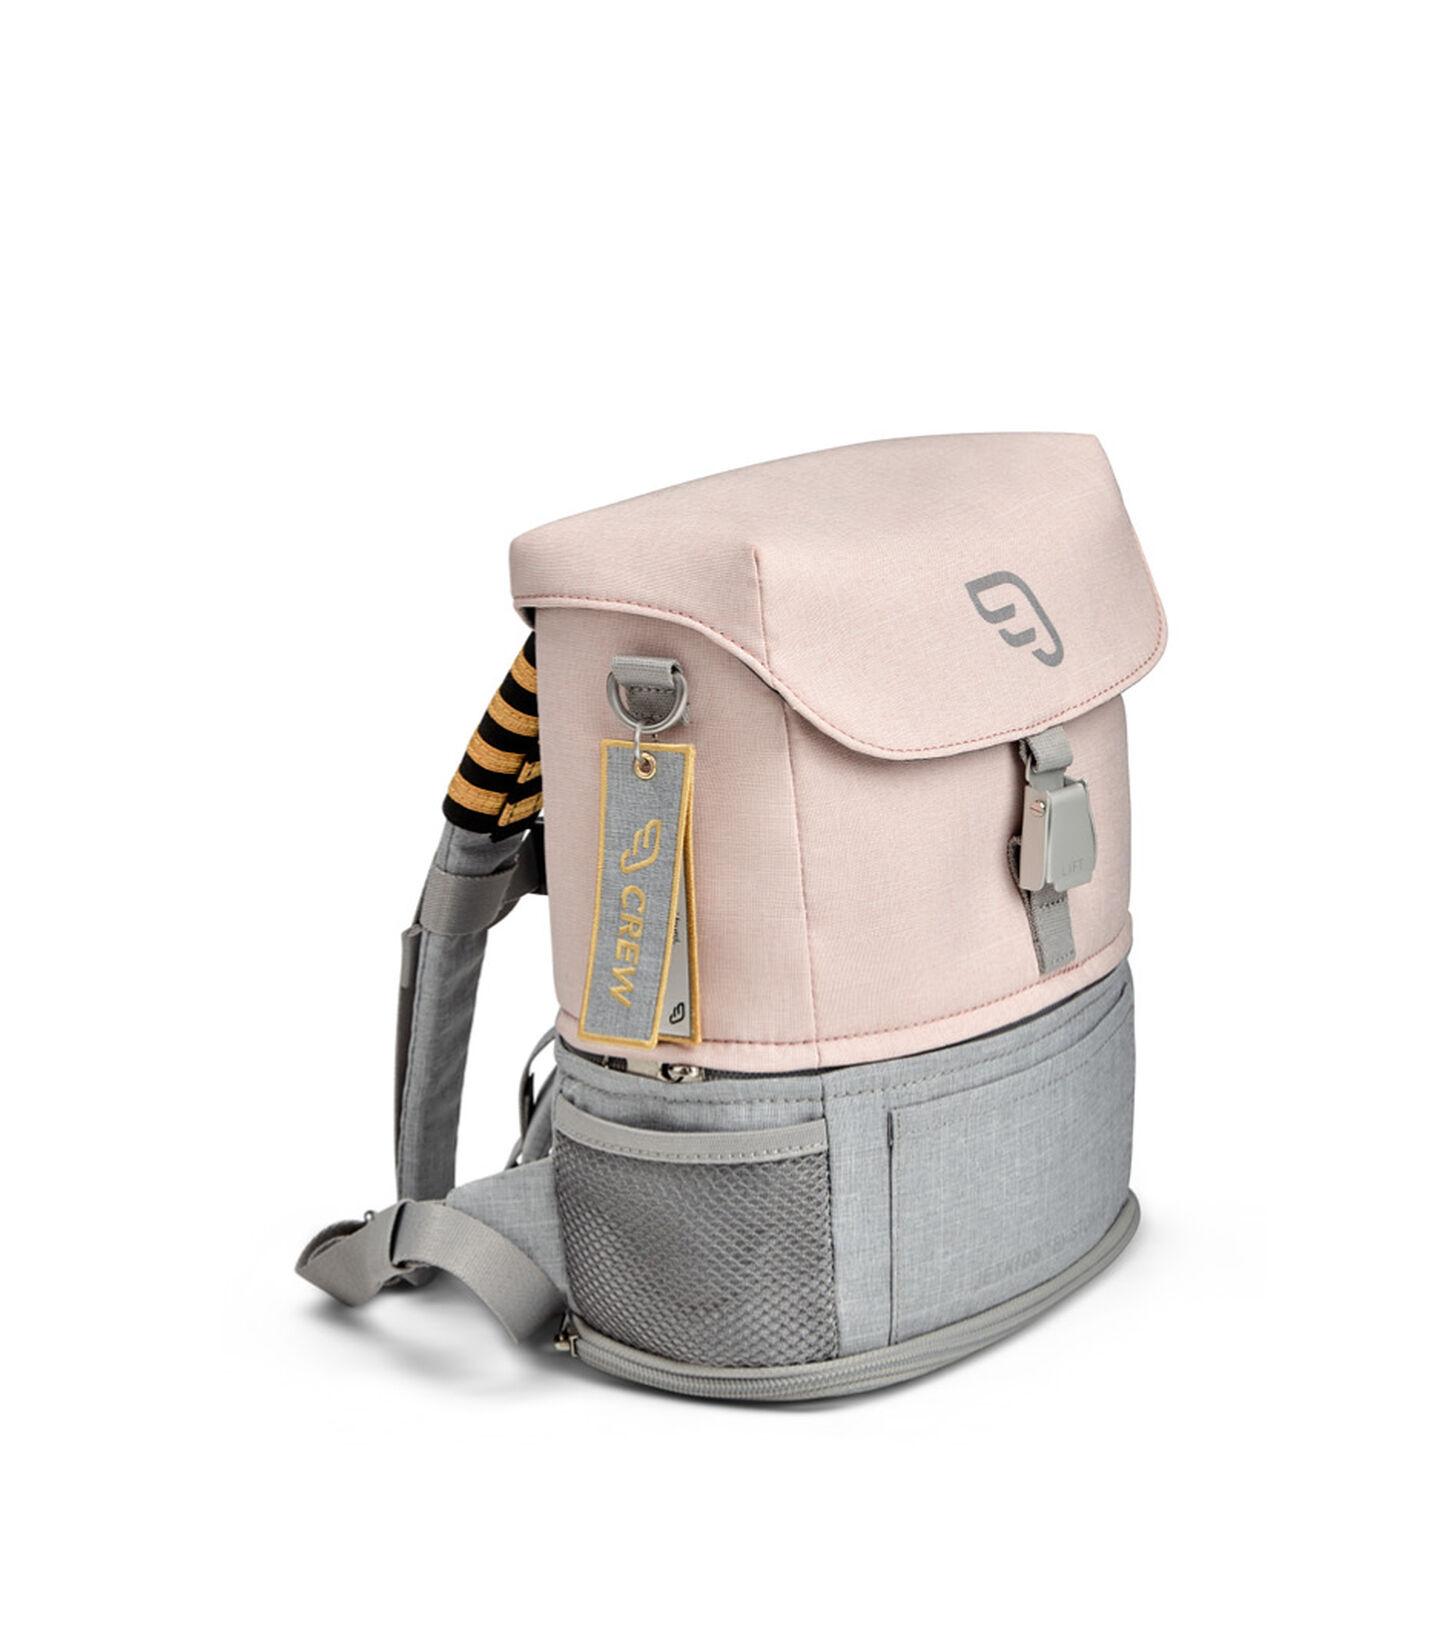 JETKIDS Crew Backpack Pink Lemonade, Pink Lemonade, mainview view 2